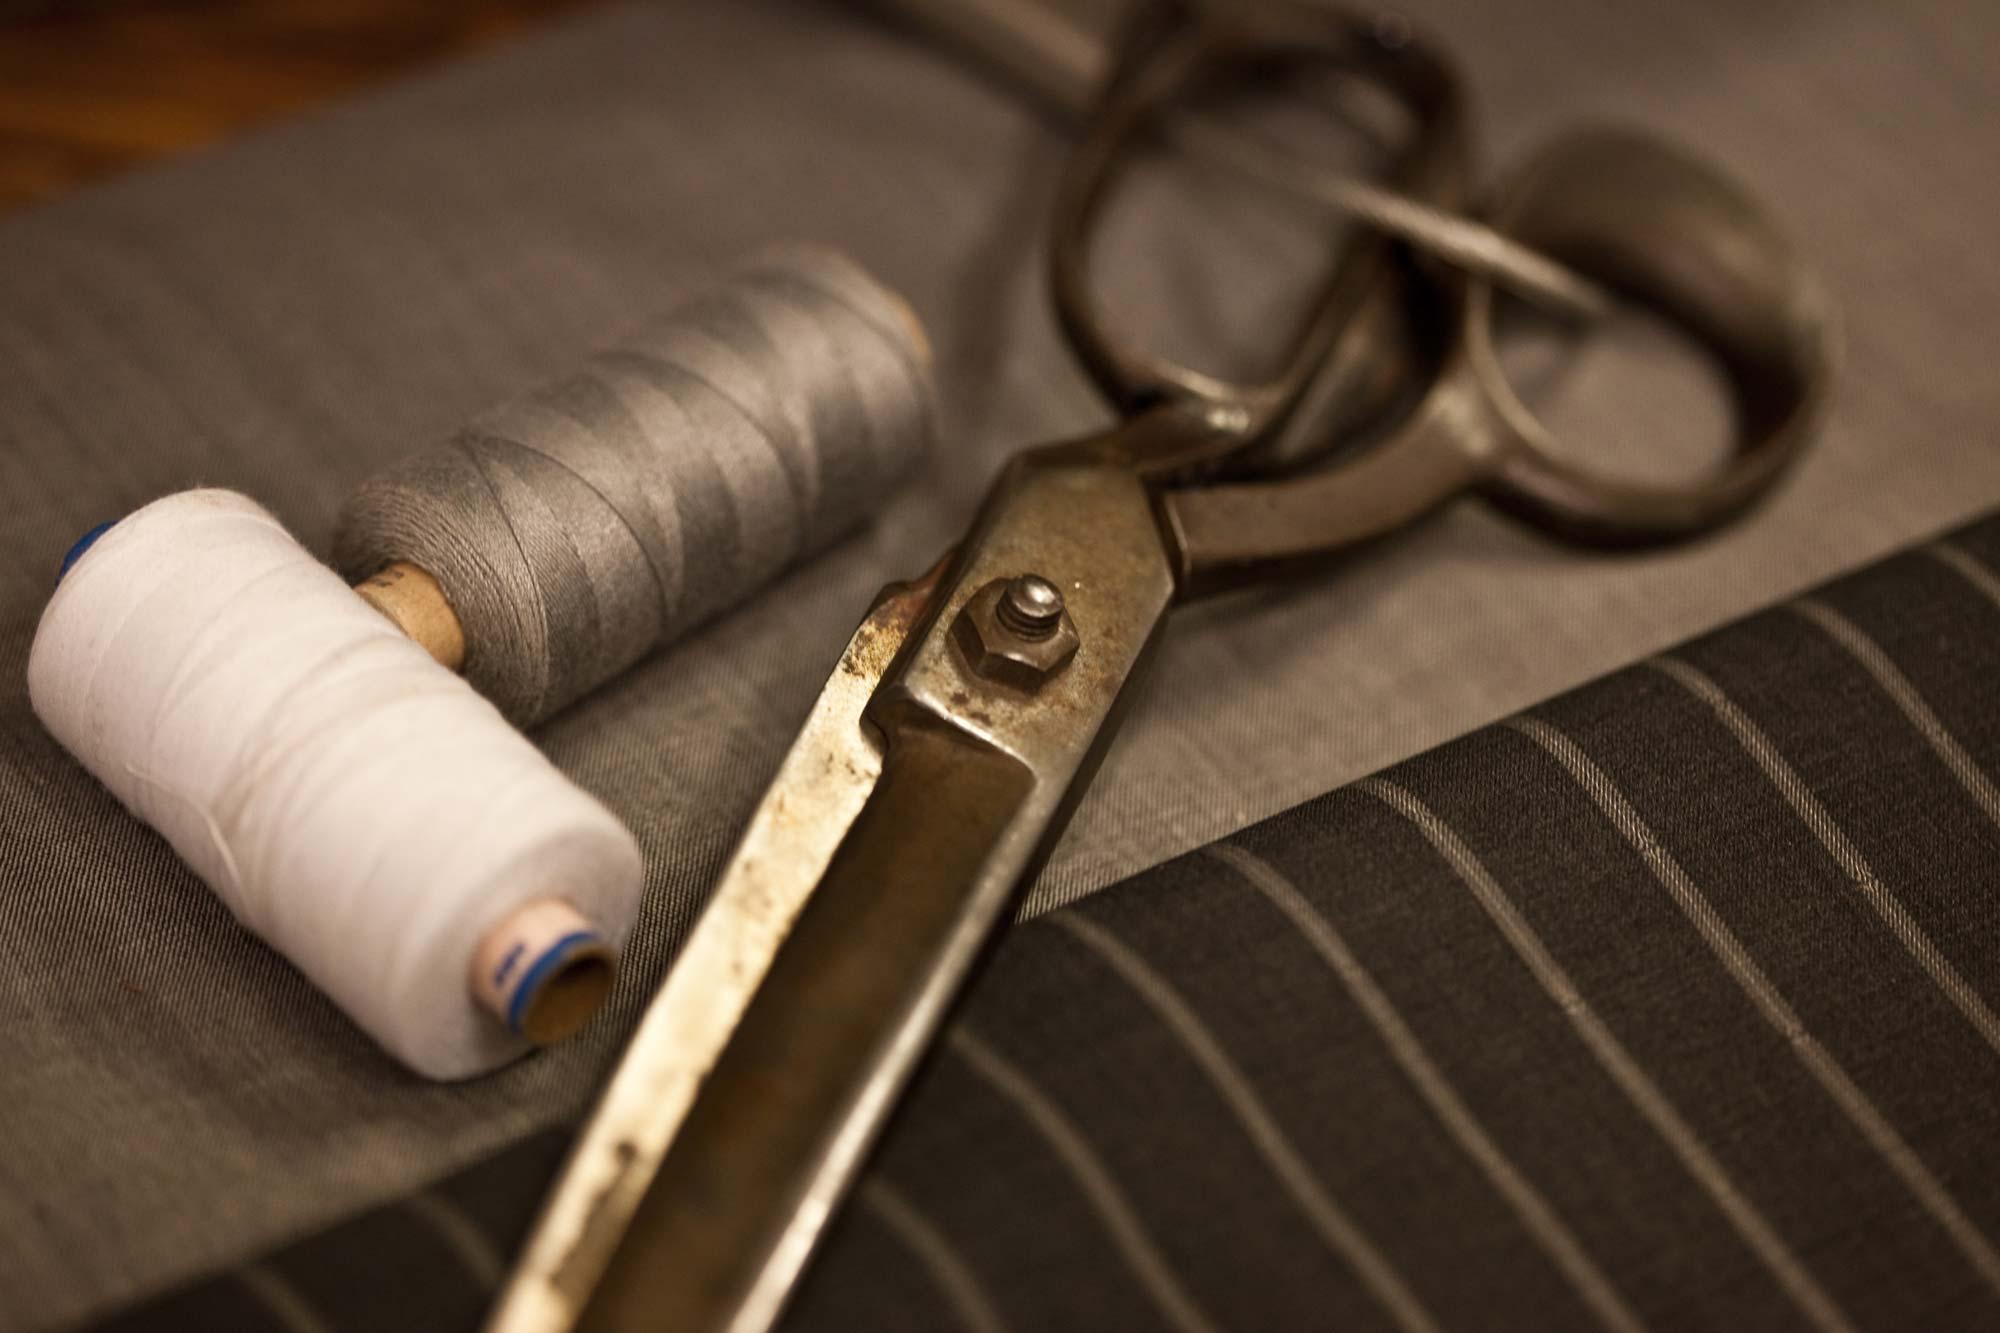 Garment Alteration and Repair